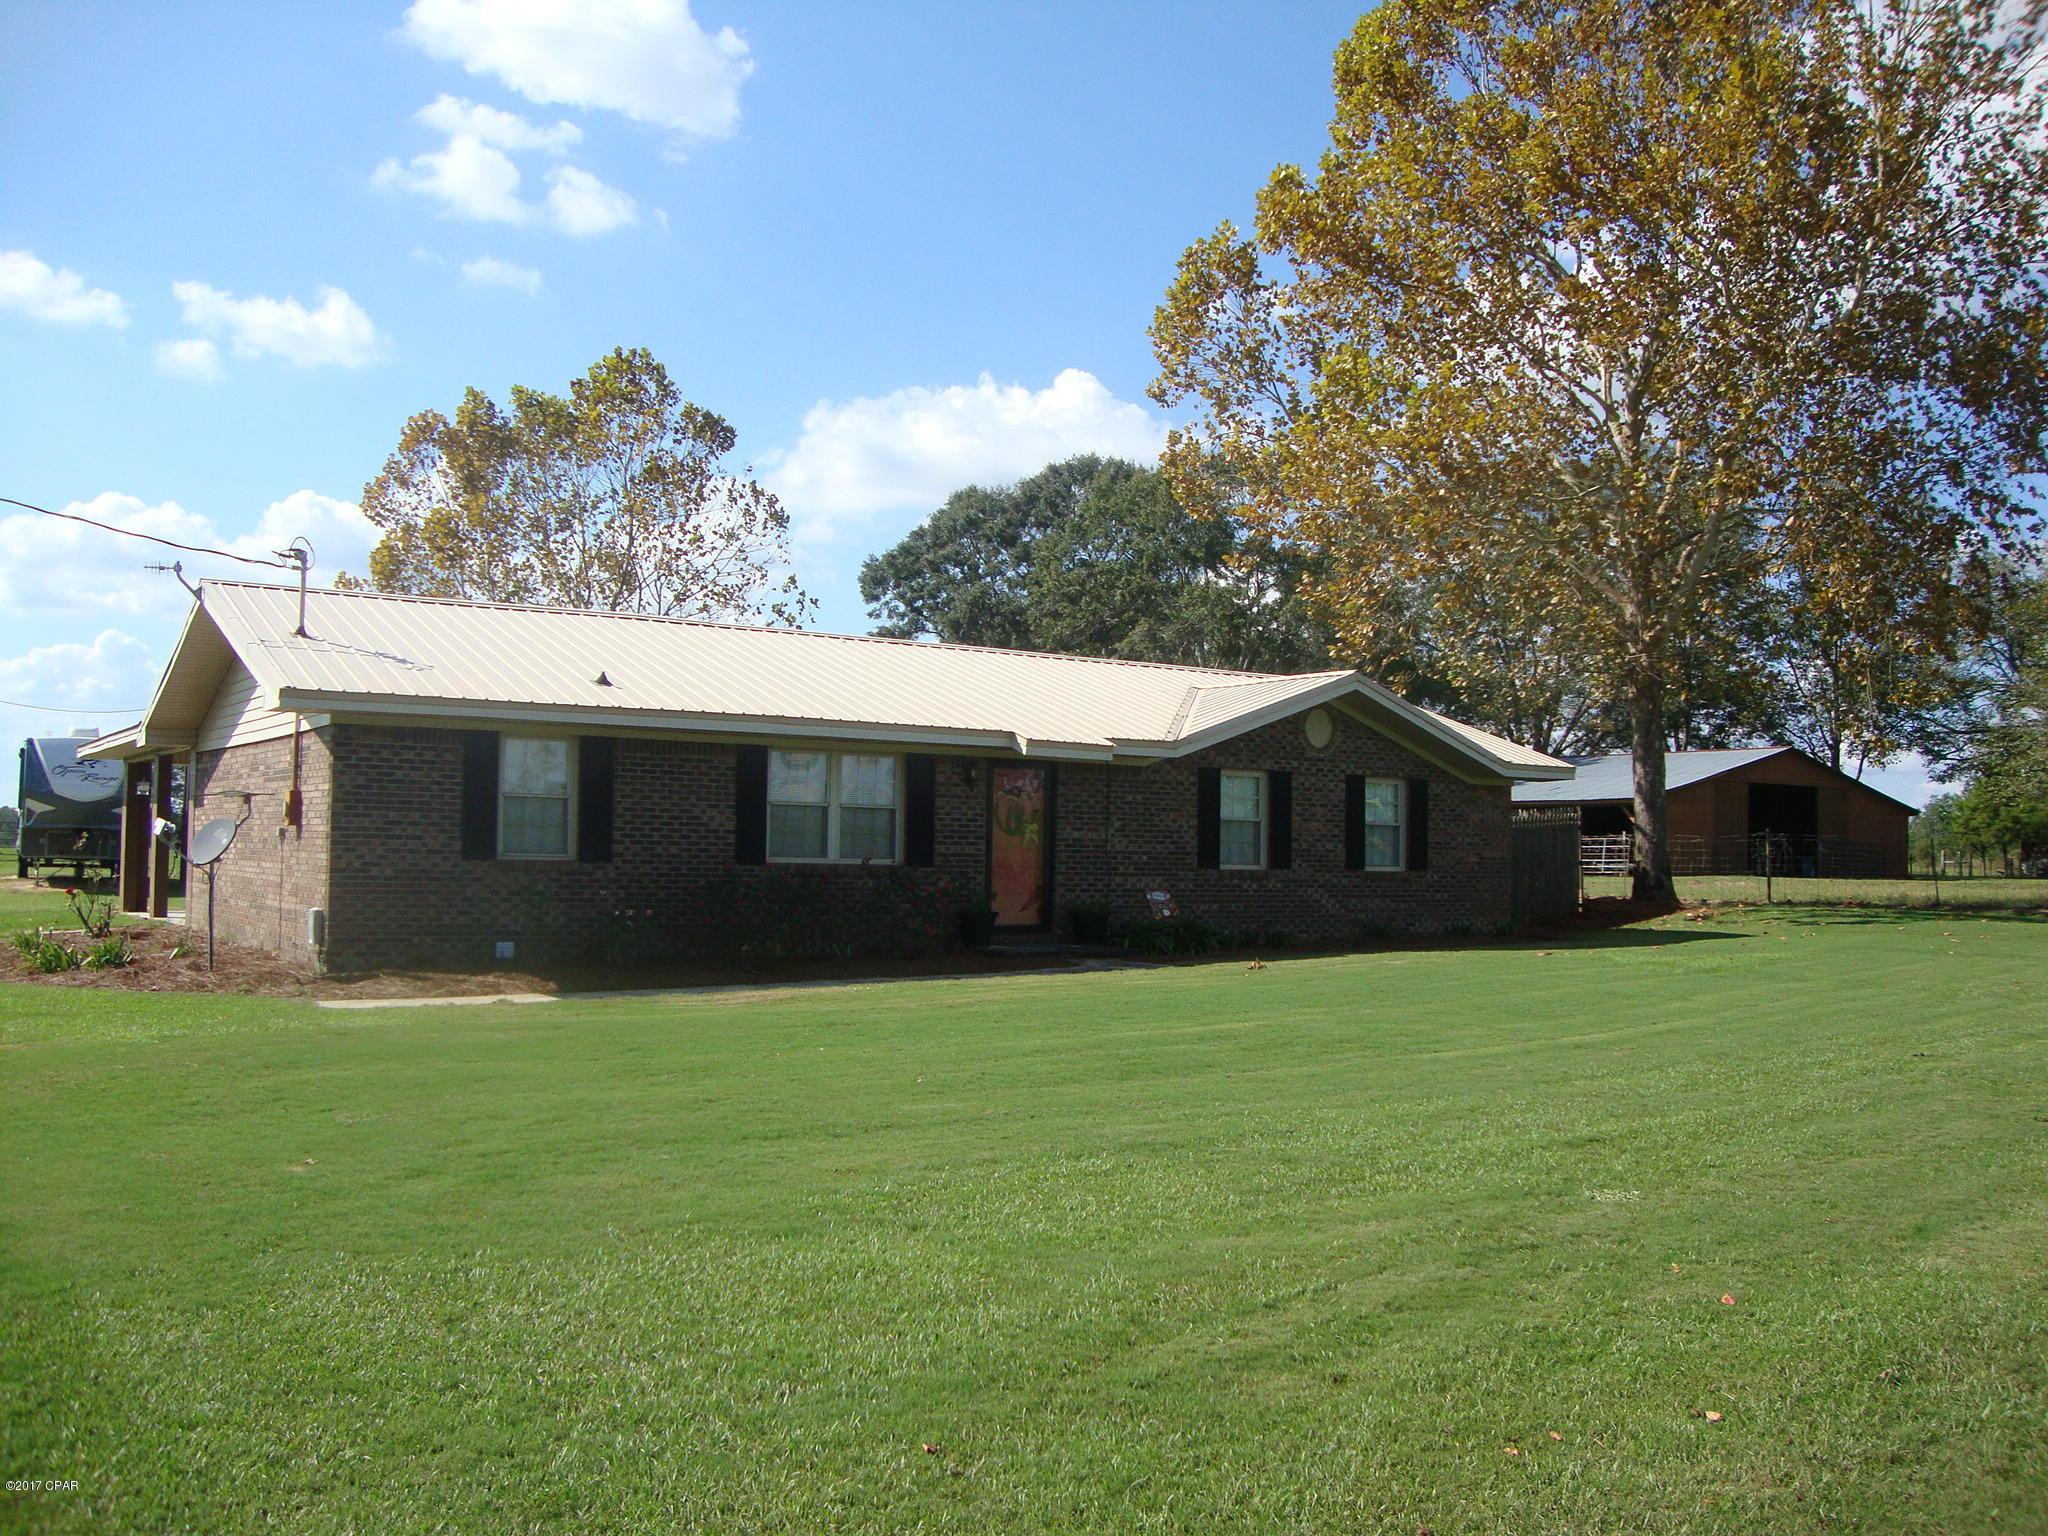 Photo of 1116 NEW BAYVIEW CHURCH Road Bonifay FL 32425